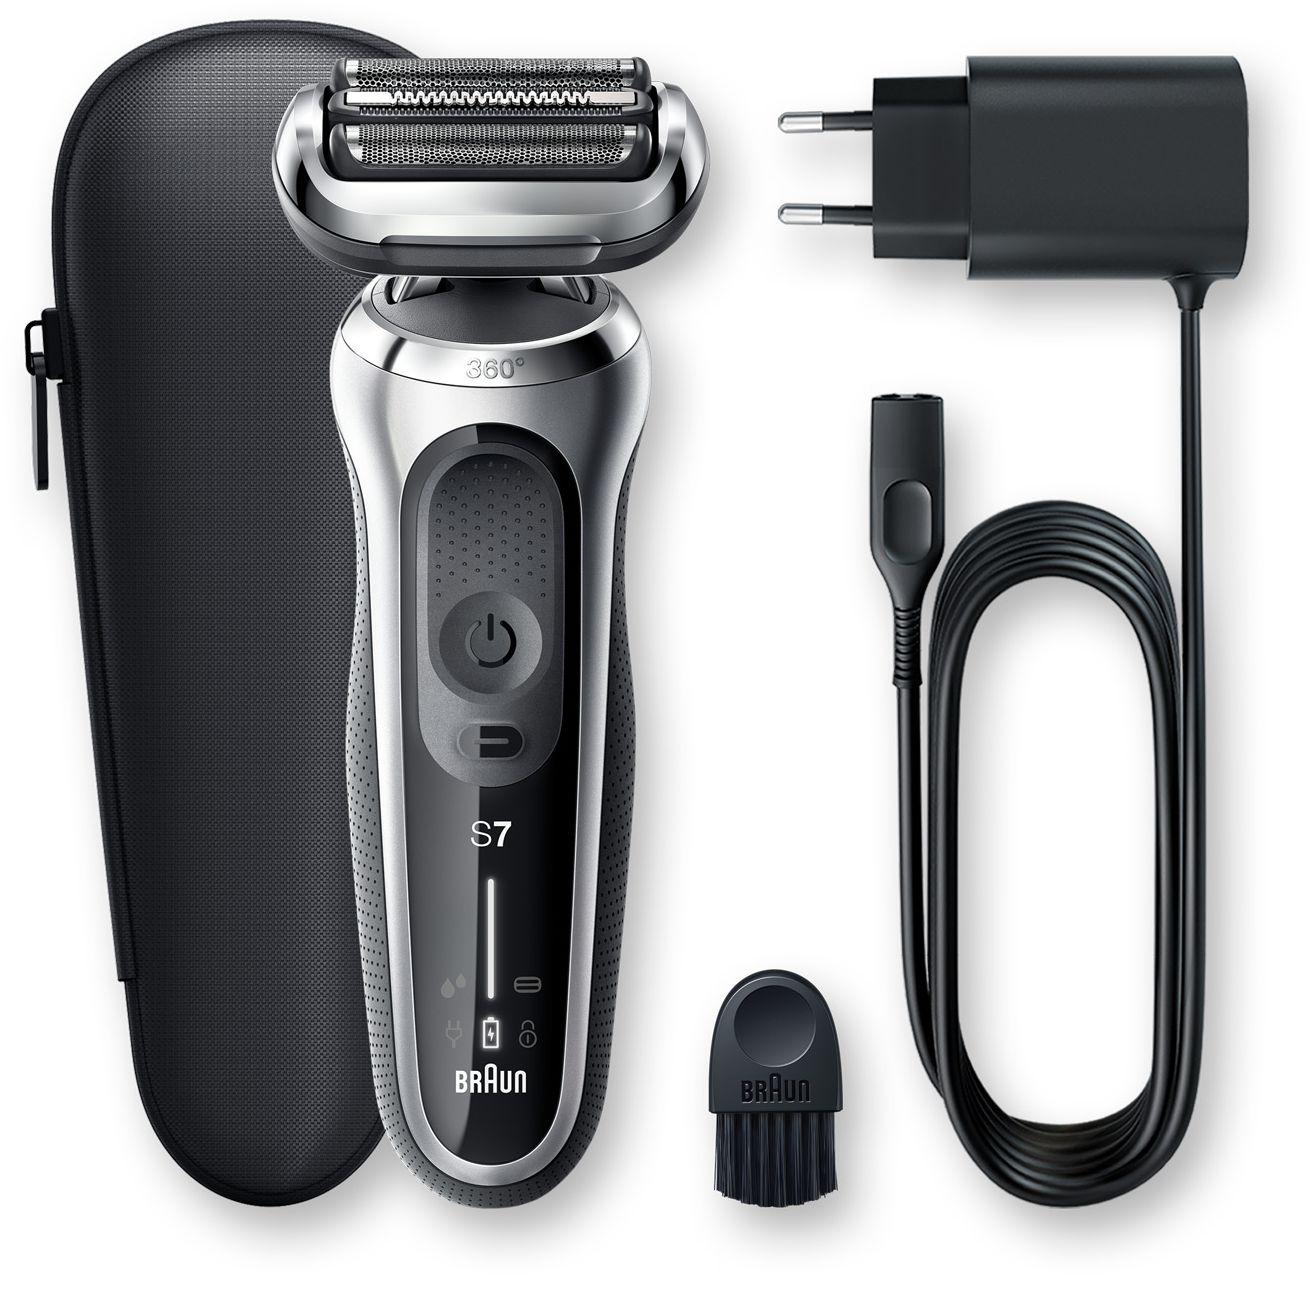 Braun Shaver 70-S1000s Cordless, Charging time 1 h, Lithium Ion, Number of shaver heads/blades 3, Black/Silver, Wet & Dry 4210201242345 Vīriešu skuveklis